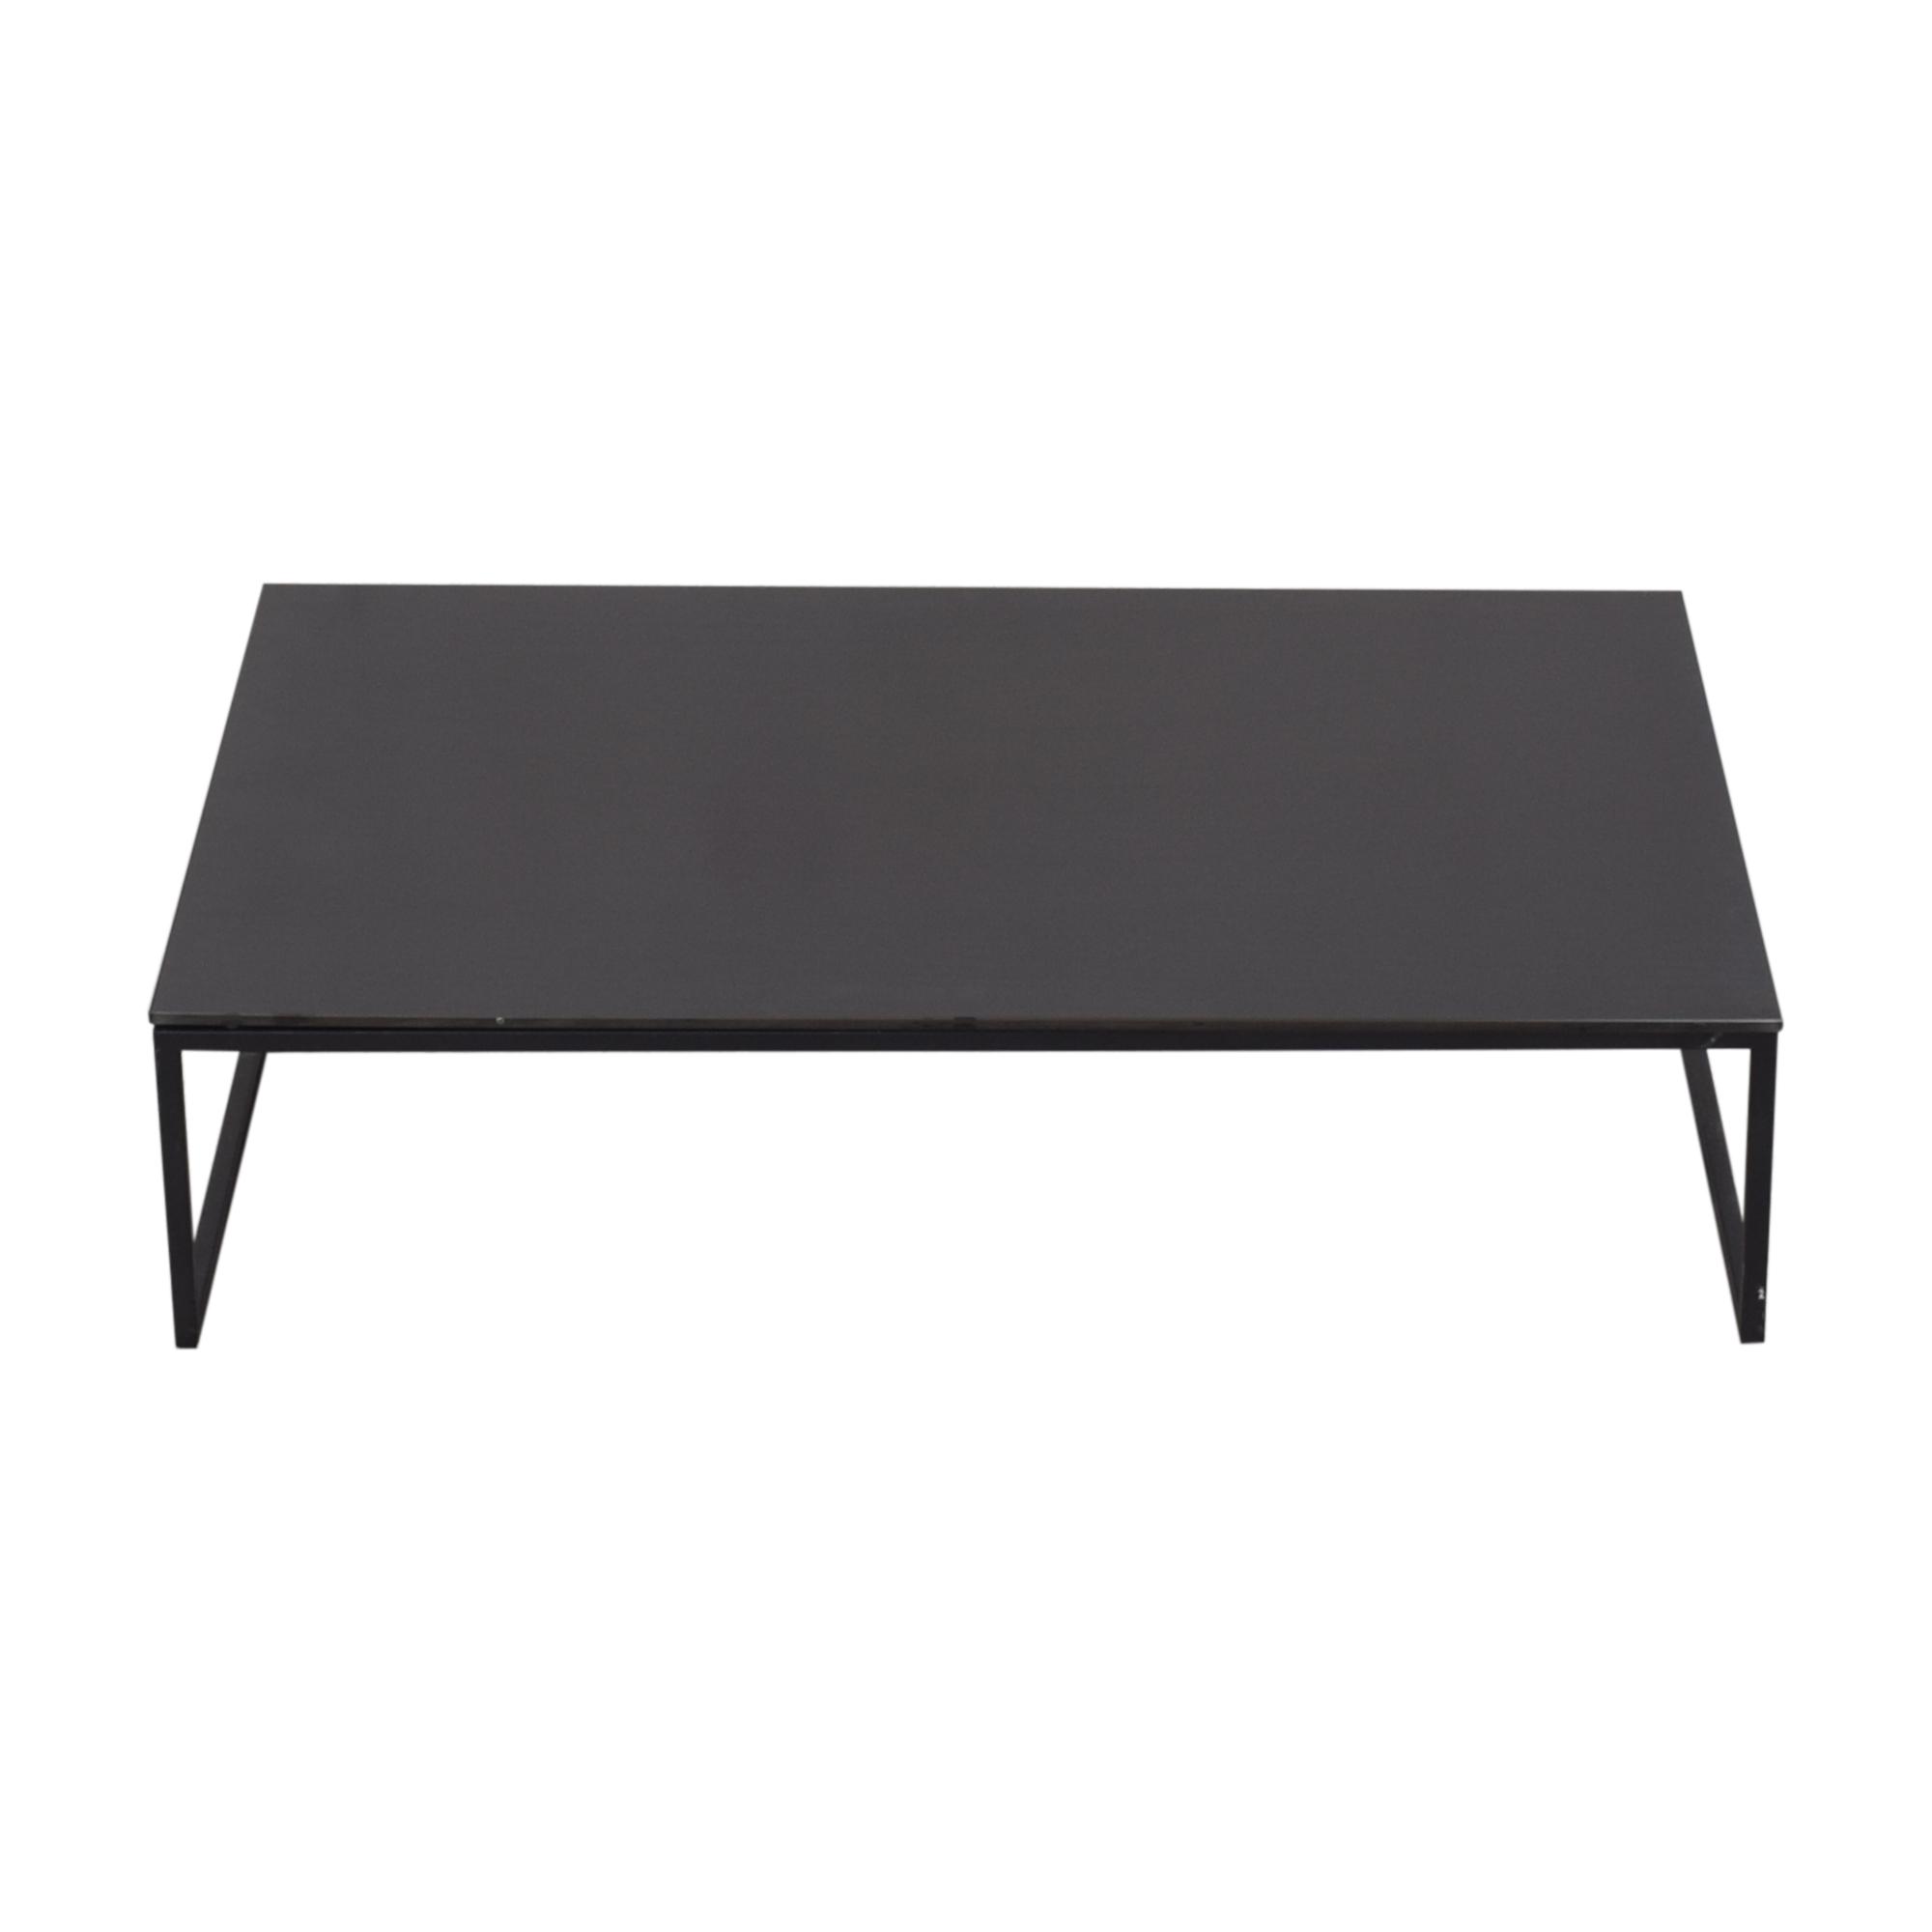 Black Glass & Metal Coffee Table for sale